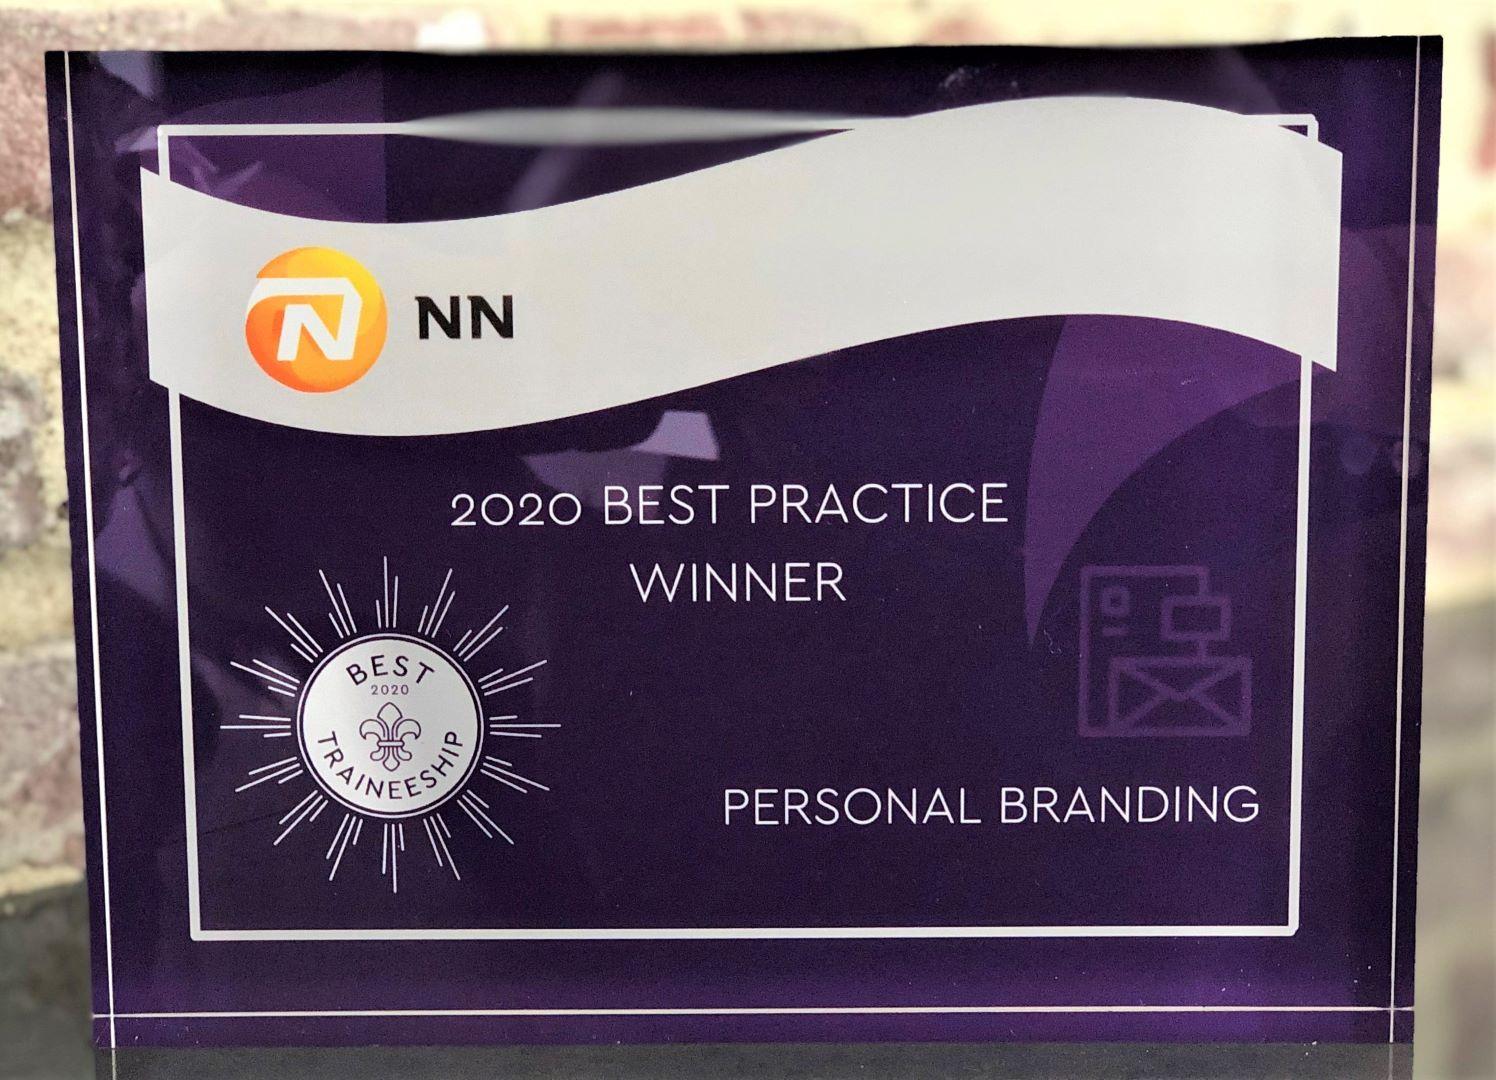 NN Group - Best Practice 2020